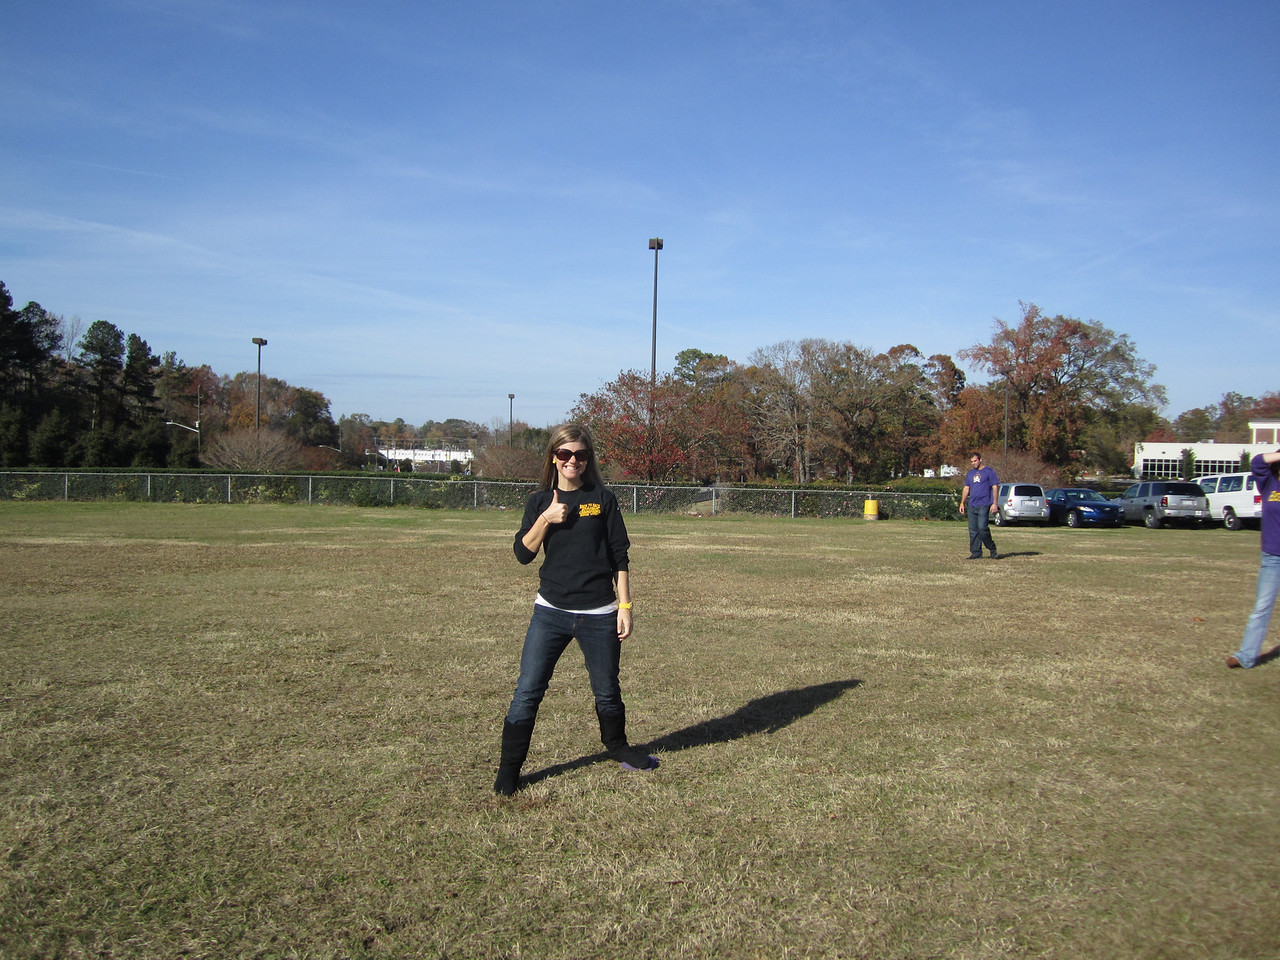 11/19/2011 ECU vs University of Central Florida - Jen playing kickball